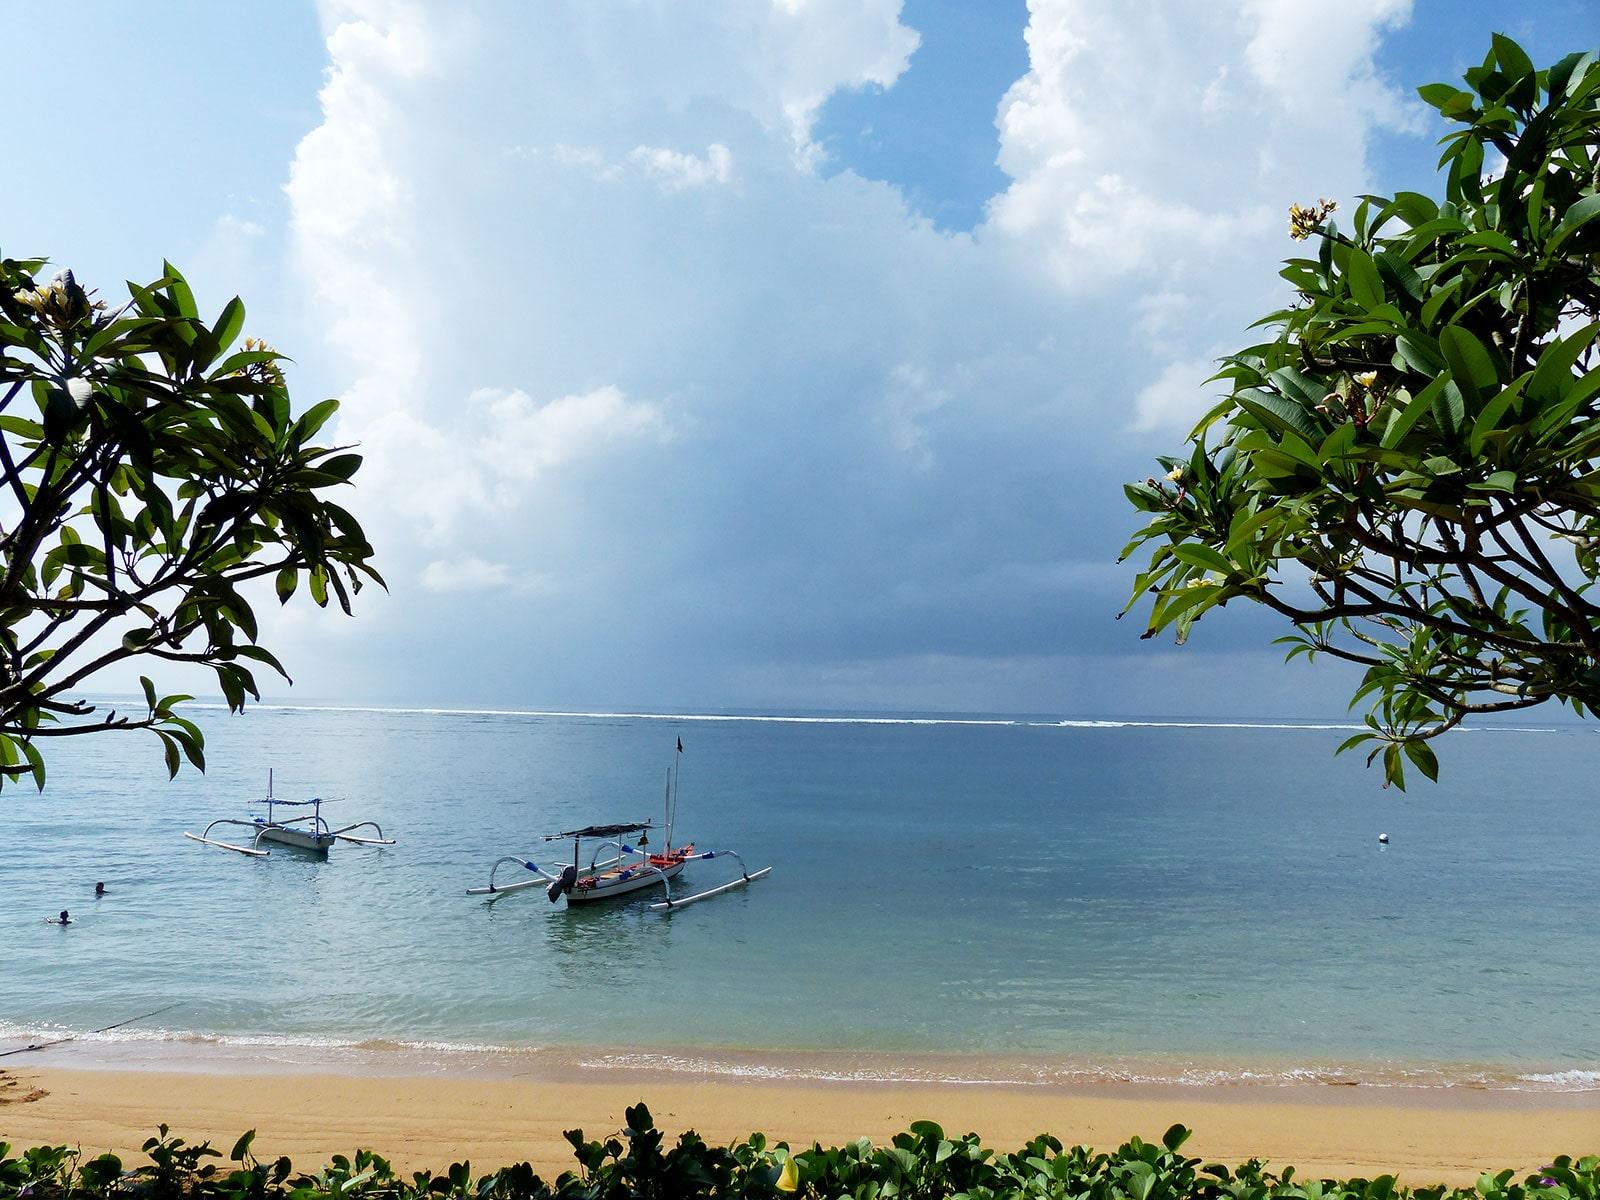 rondreis bali sanur beach hoogtepunt 21